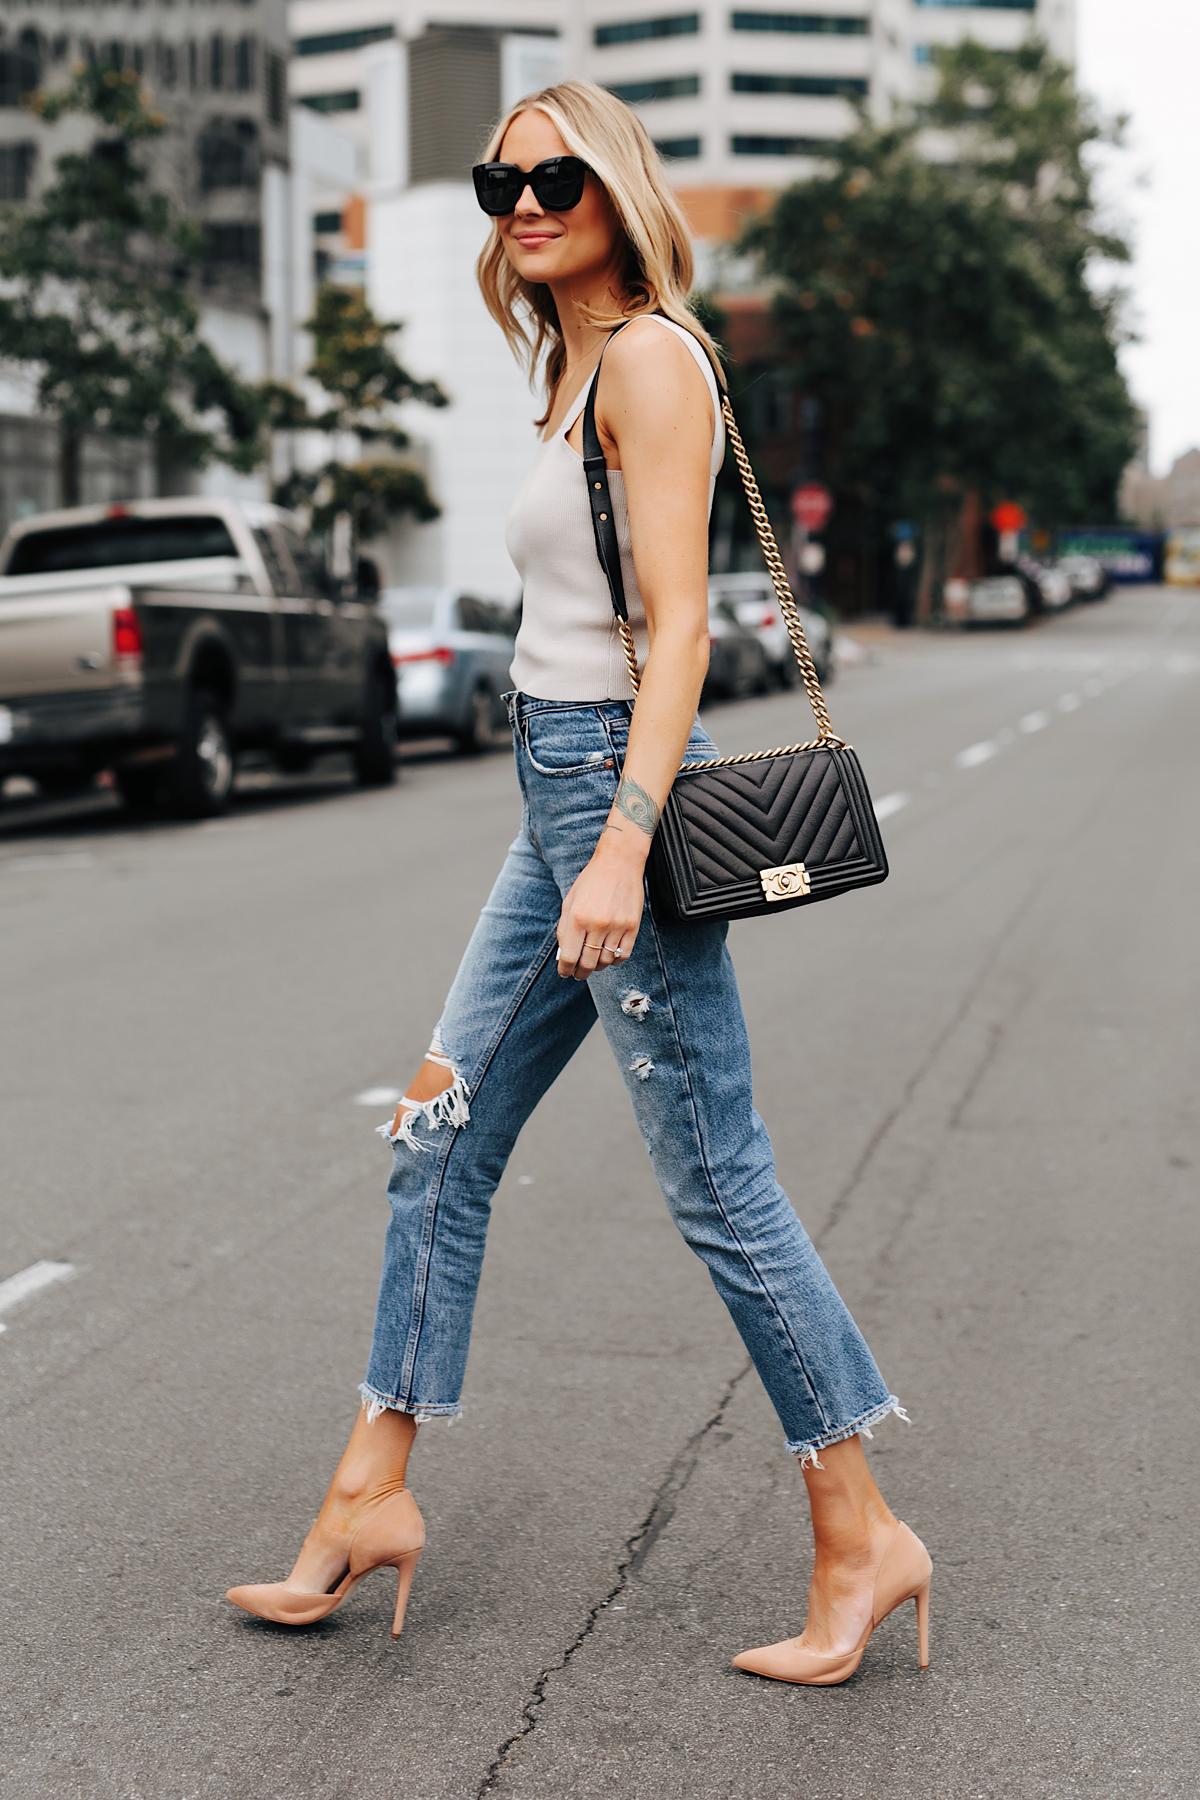 Fashion Jackson Wearing Beige Knit Tank Abercrombie Ripped Mom Jeans Tan Pumps Chanel Black Boy Bag